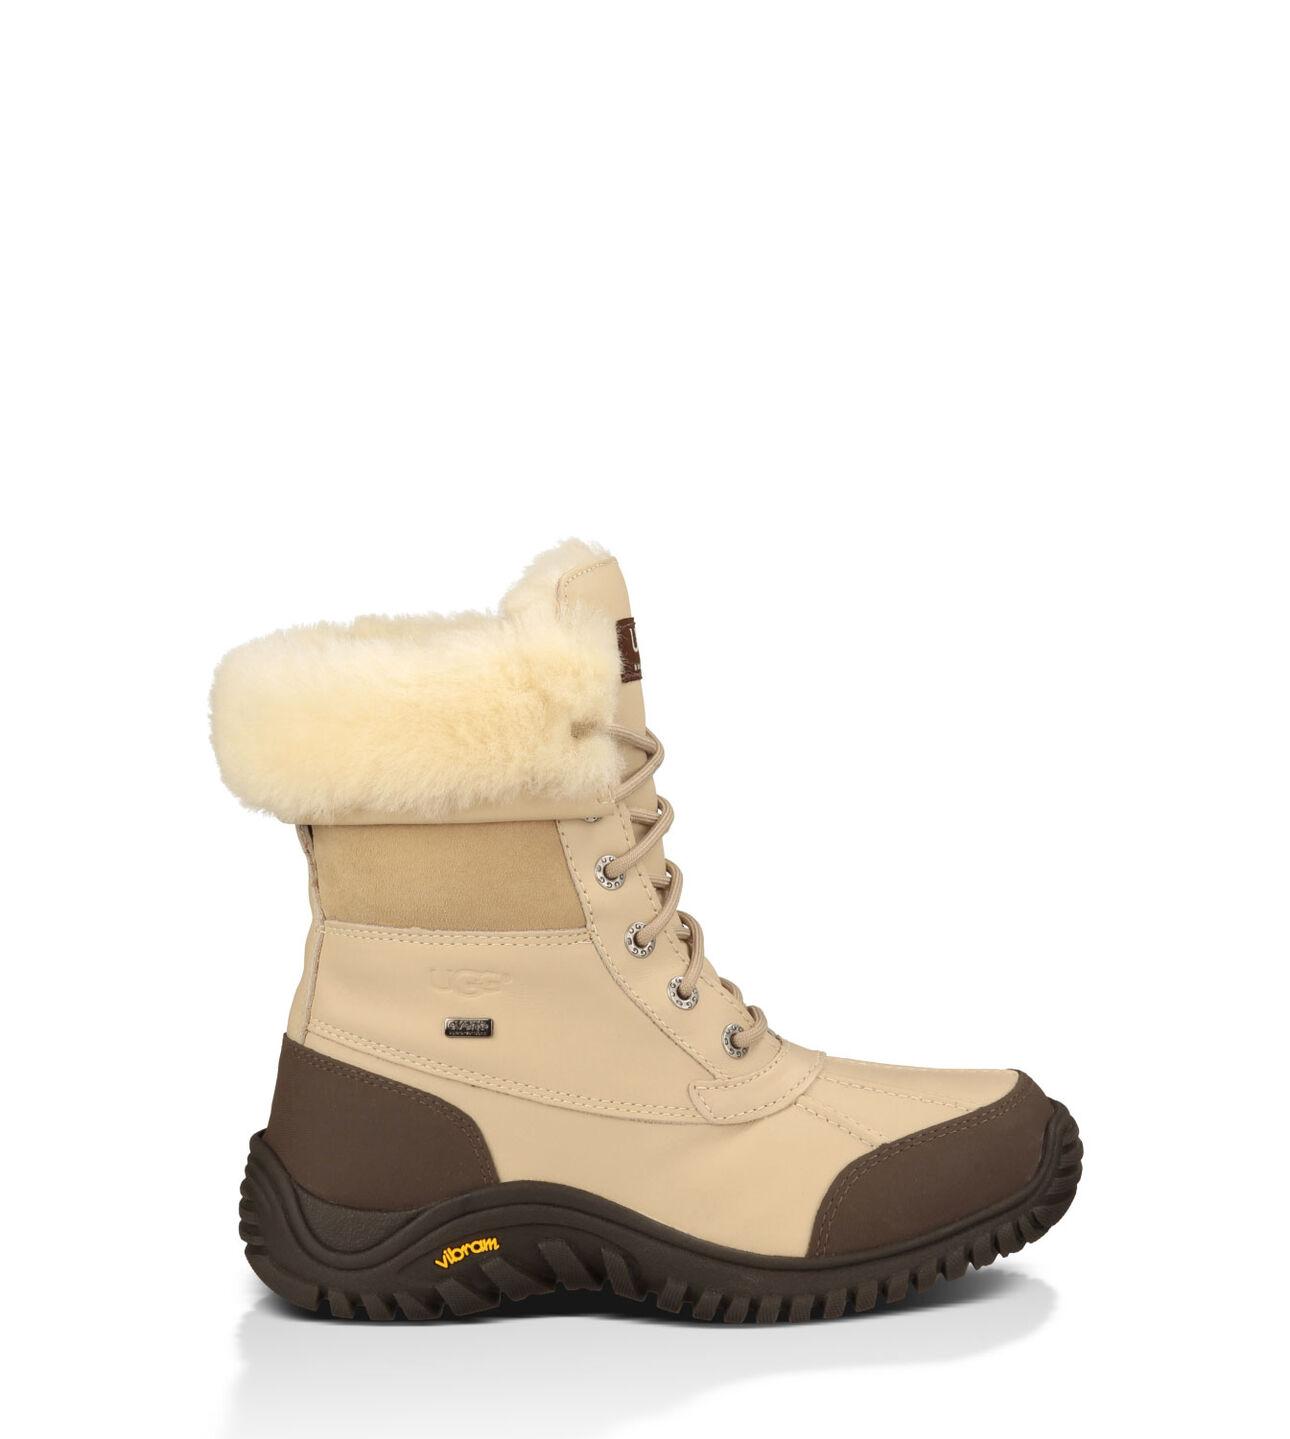 0939a015ba2 Adirondack Boot II - Leather